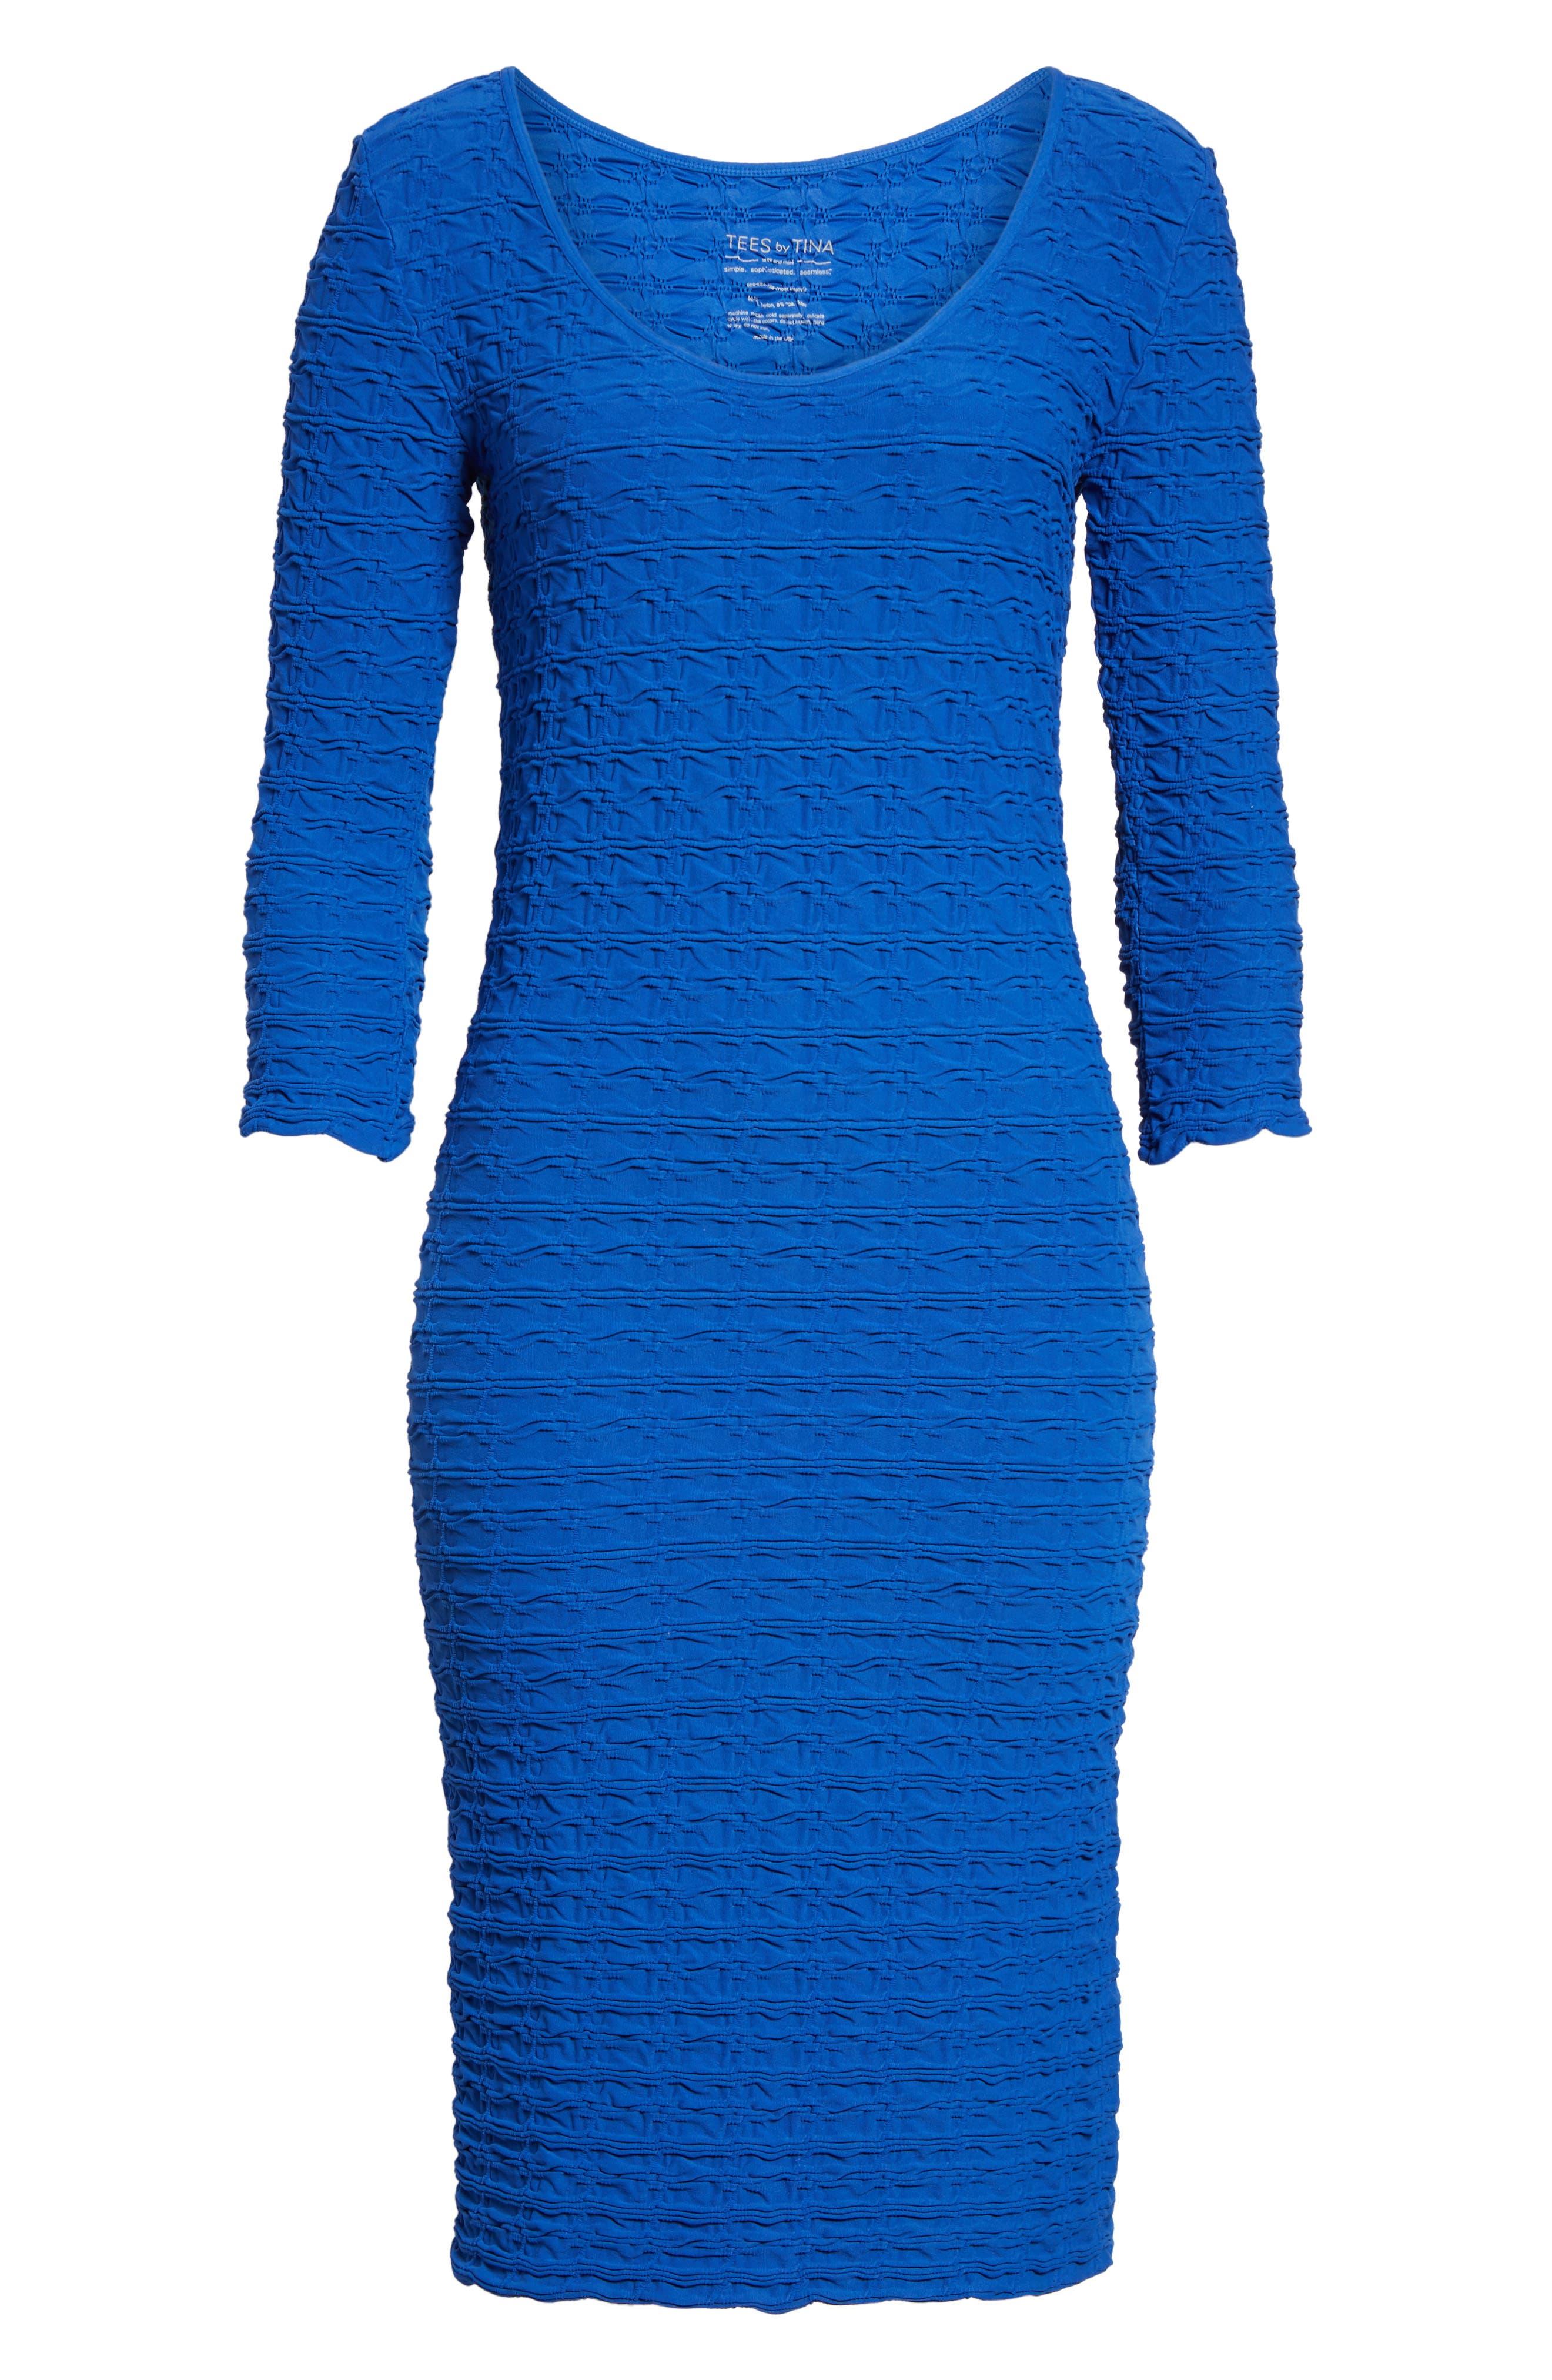 Crinkle Maternity Sheath Dress,                             Alternate thumbnail 6, color,                             400